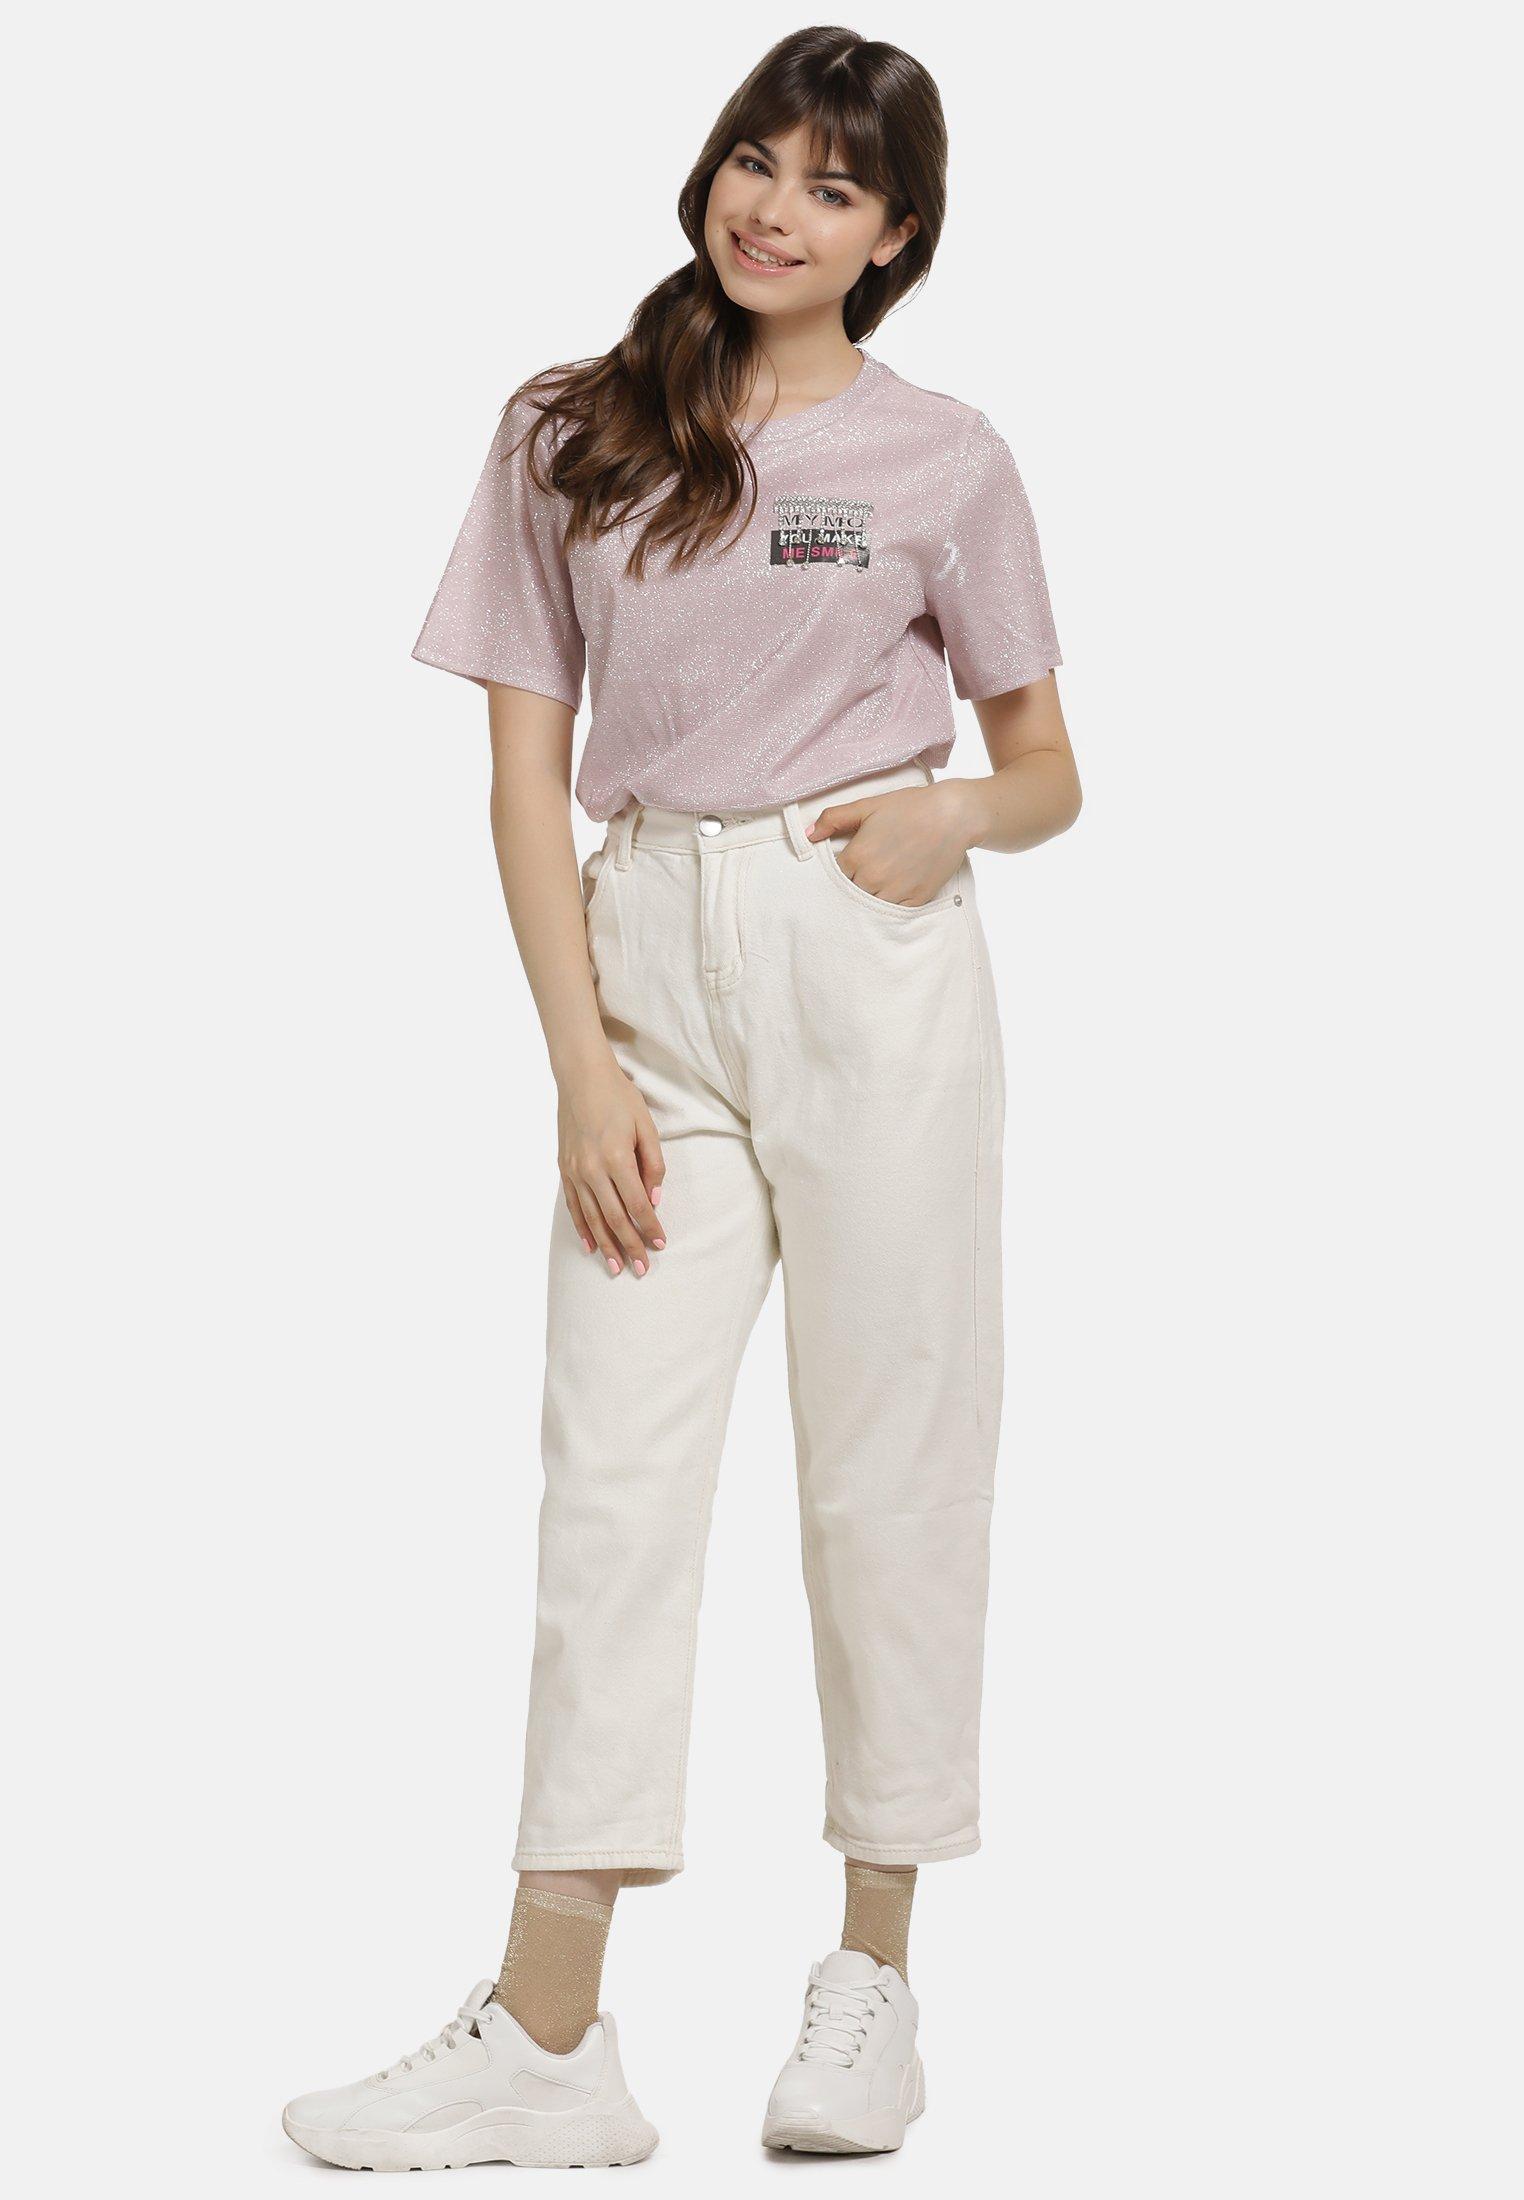 Donna SHIRT - T-shirt con stampa